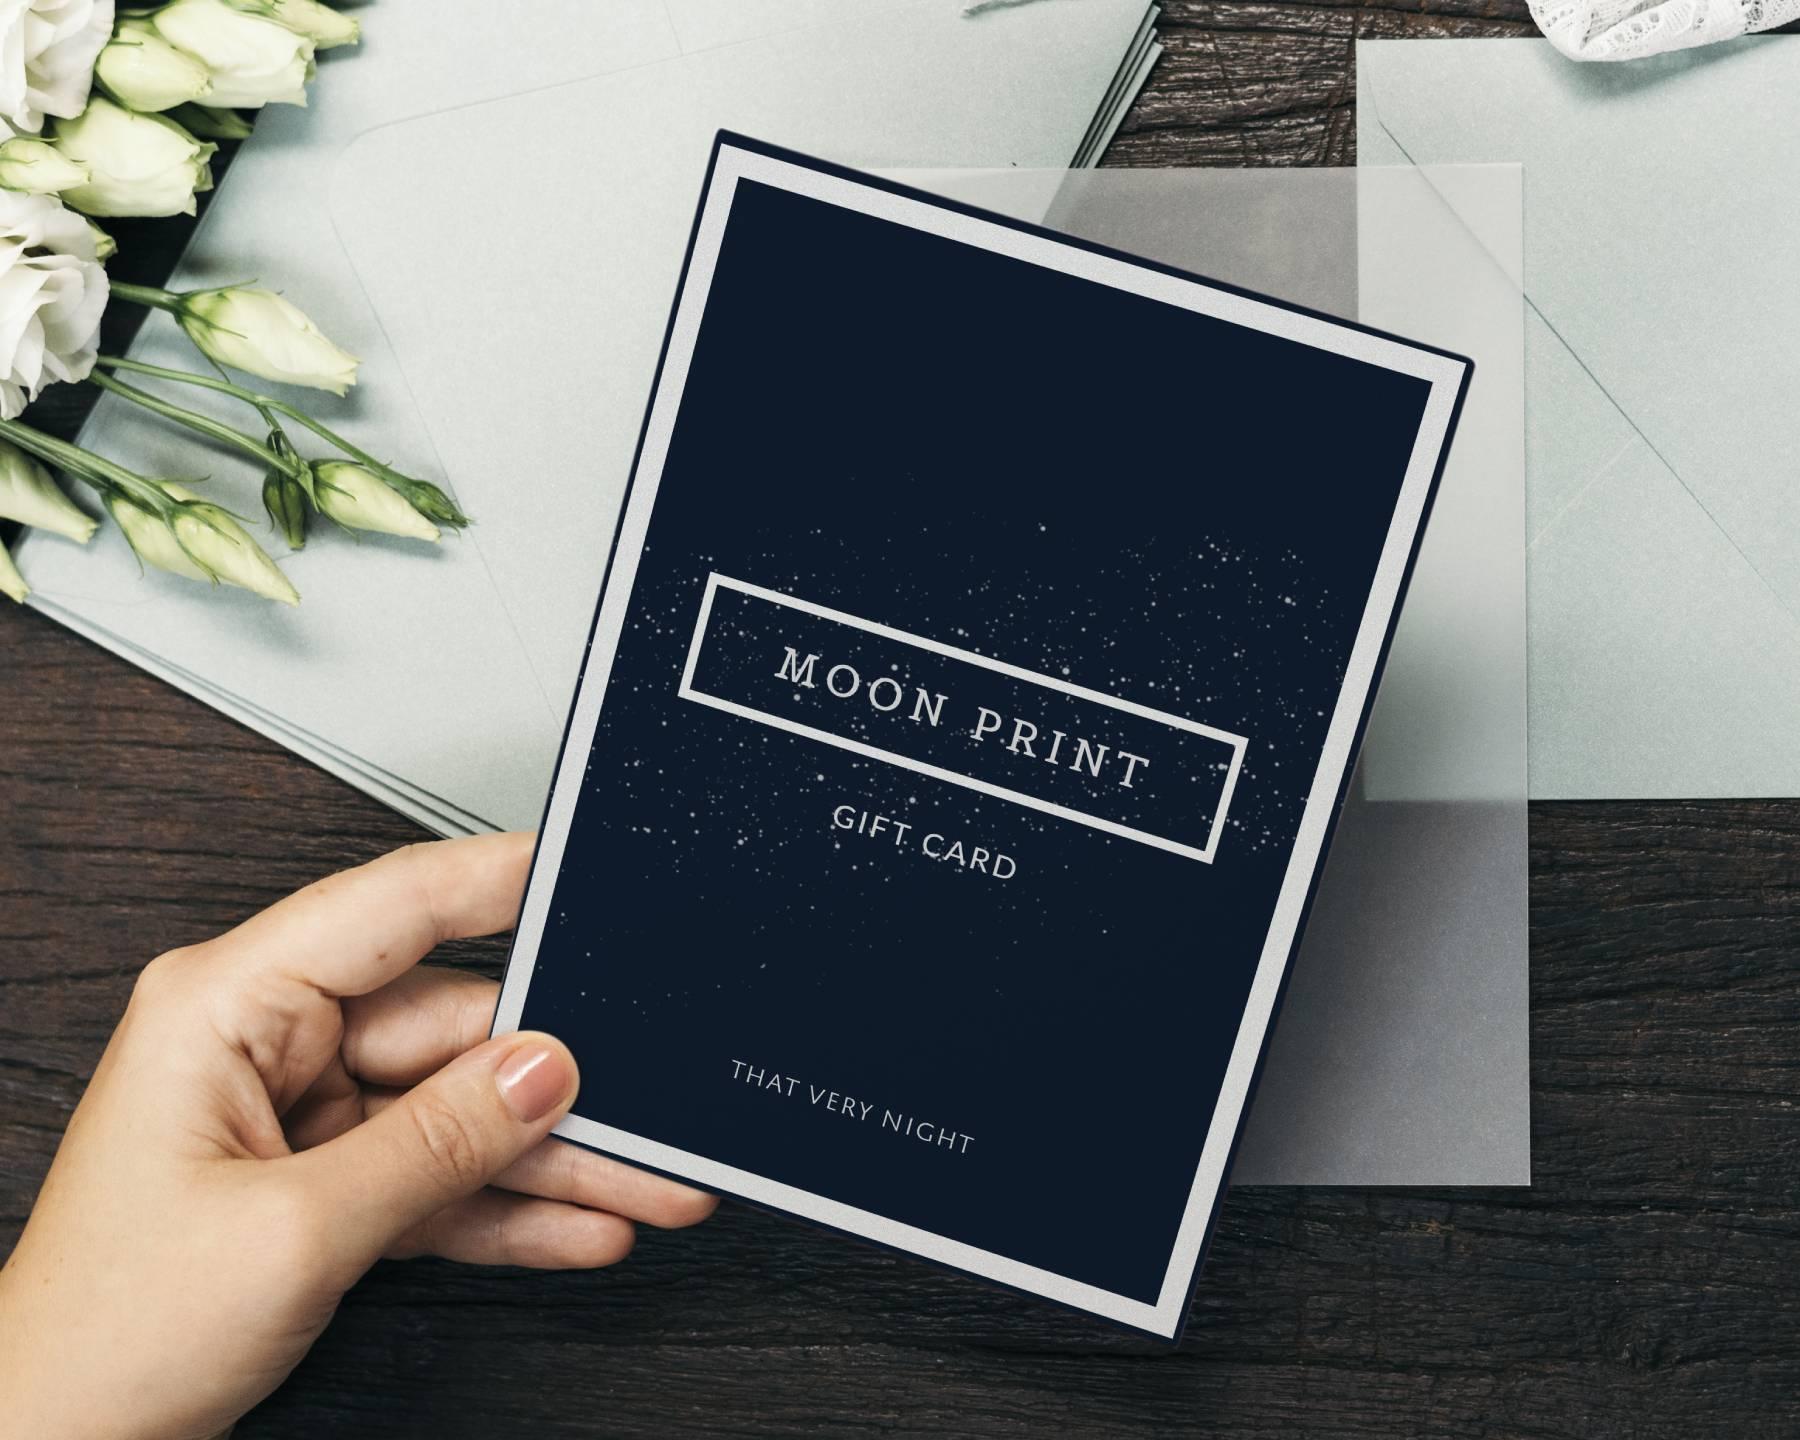 thatverynight-gift-card-6